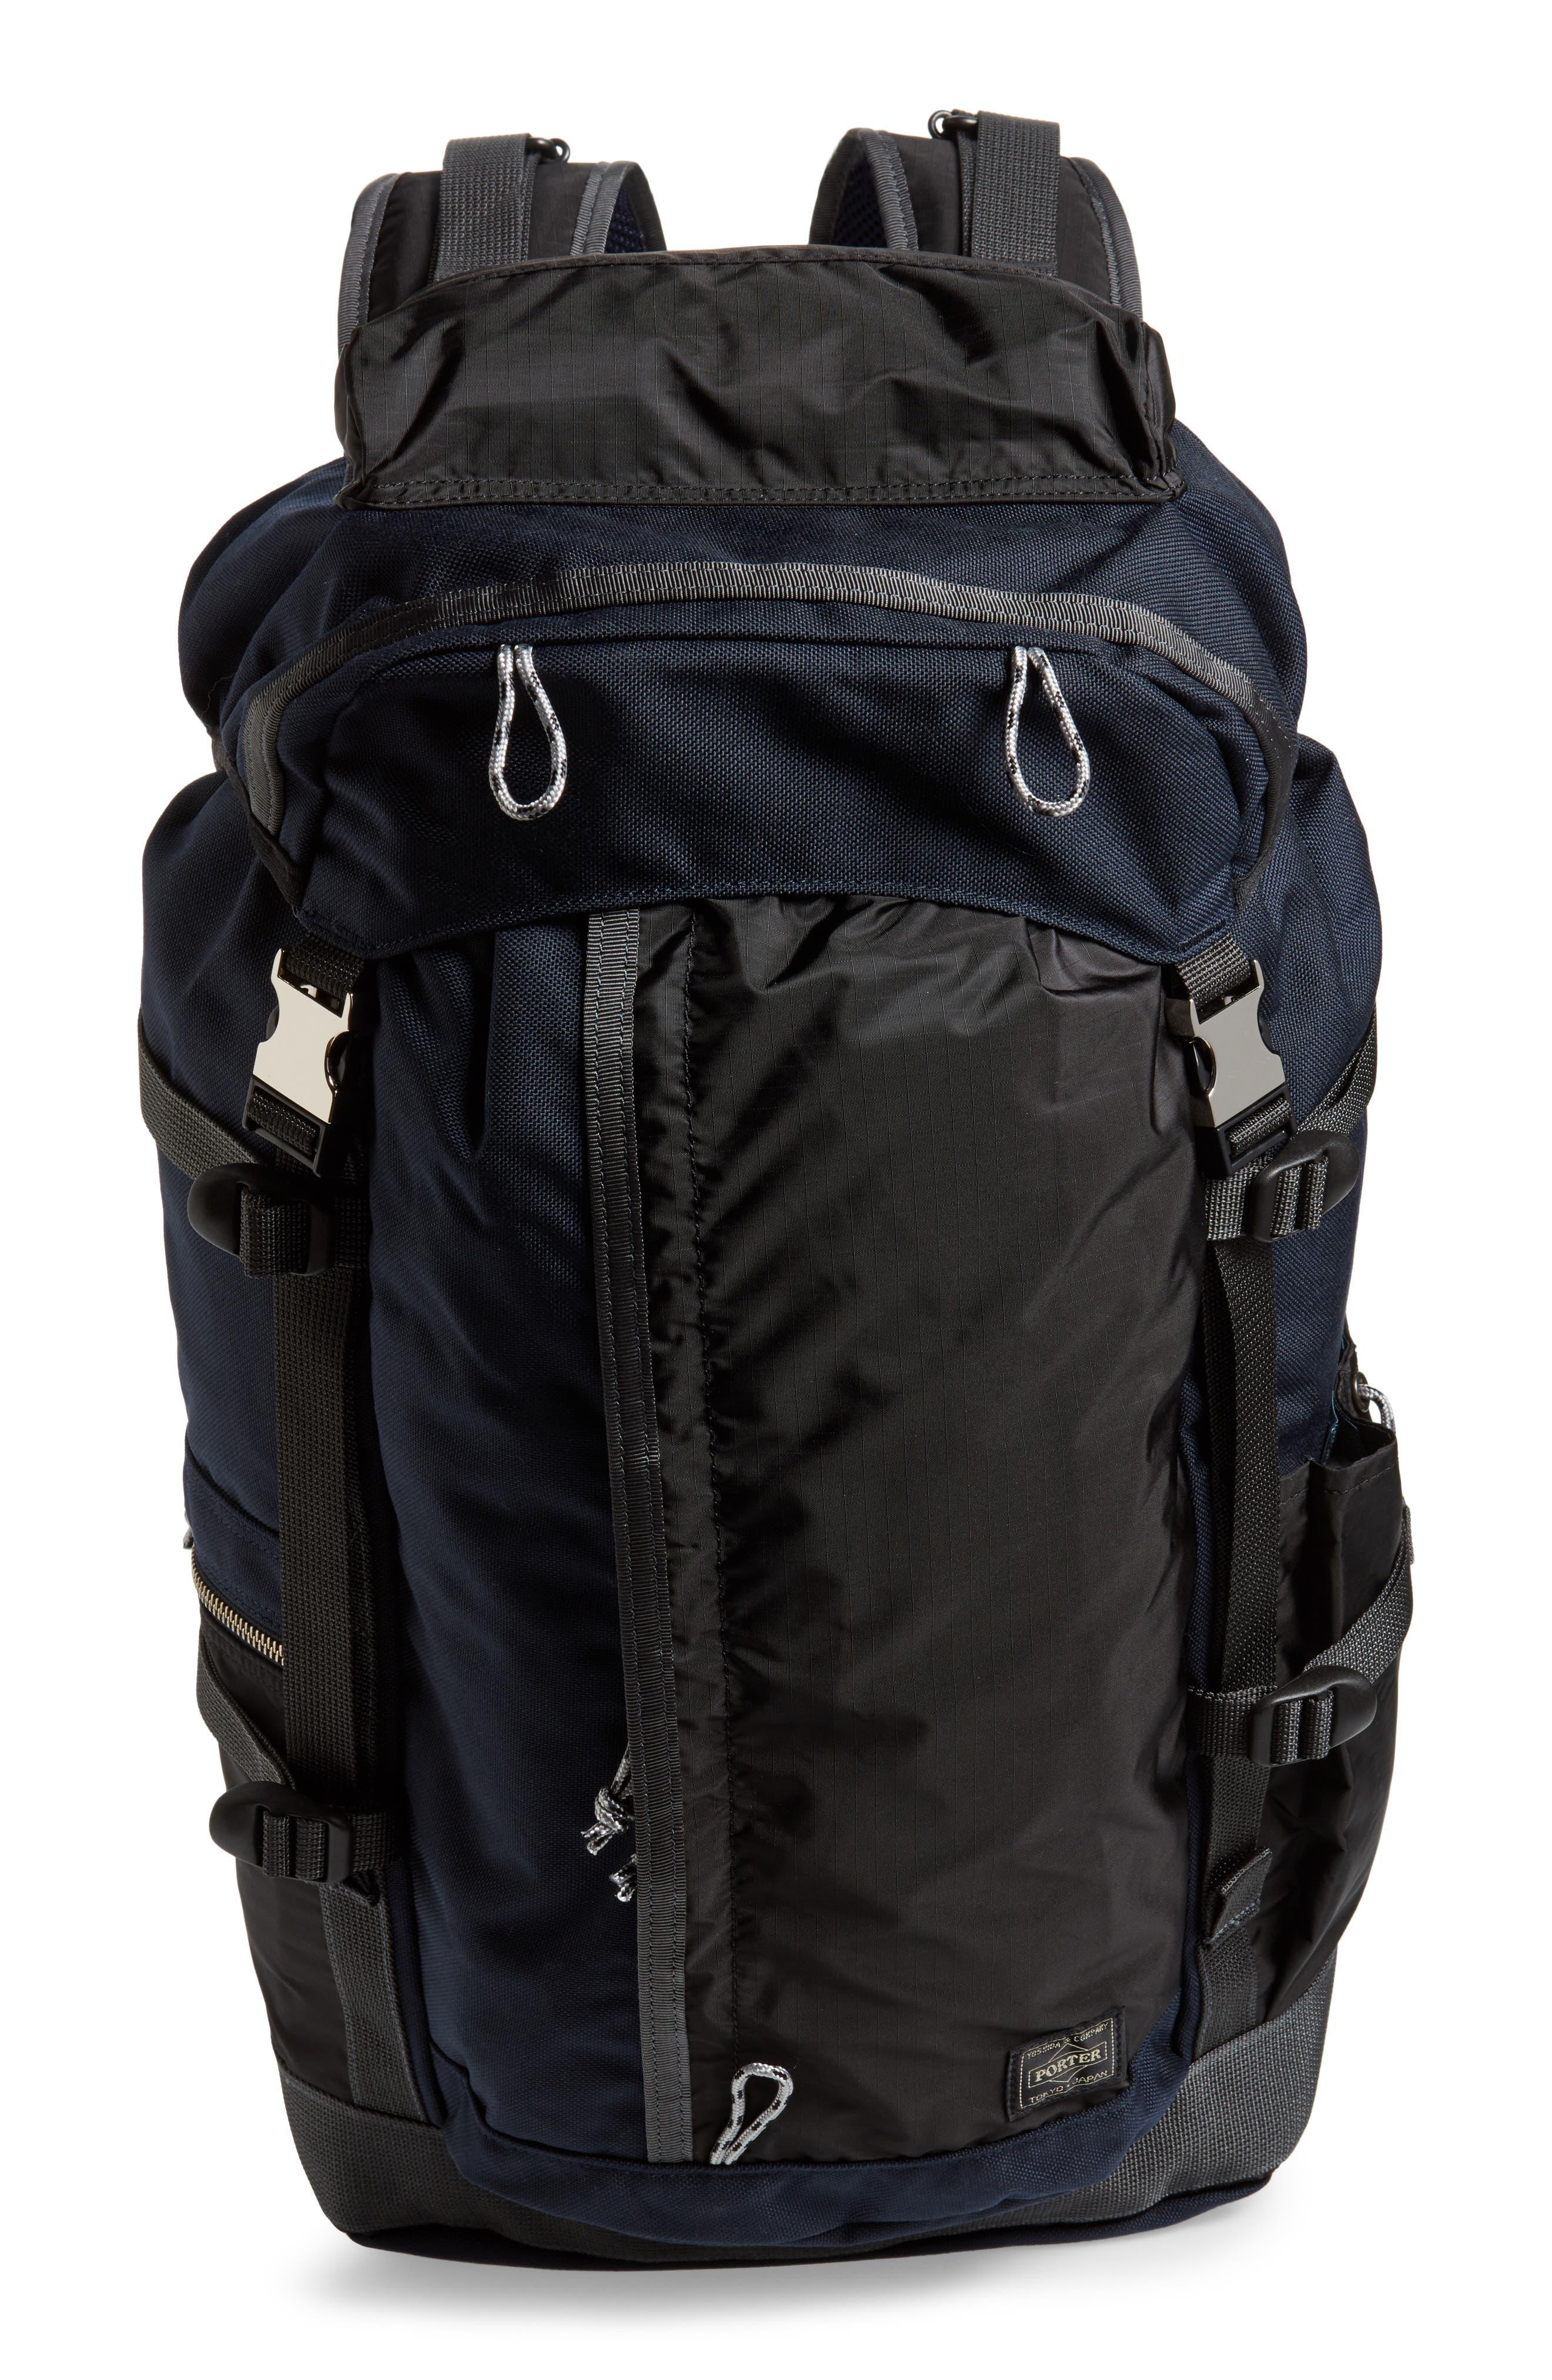 Porter-Yoshida & Co. Hype Backpack,                             Main thumbnail 1, color,                             Navy/ Black